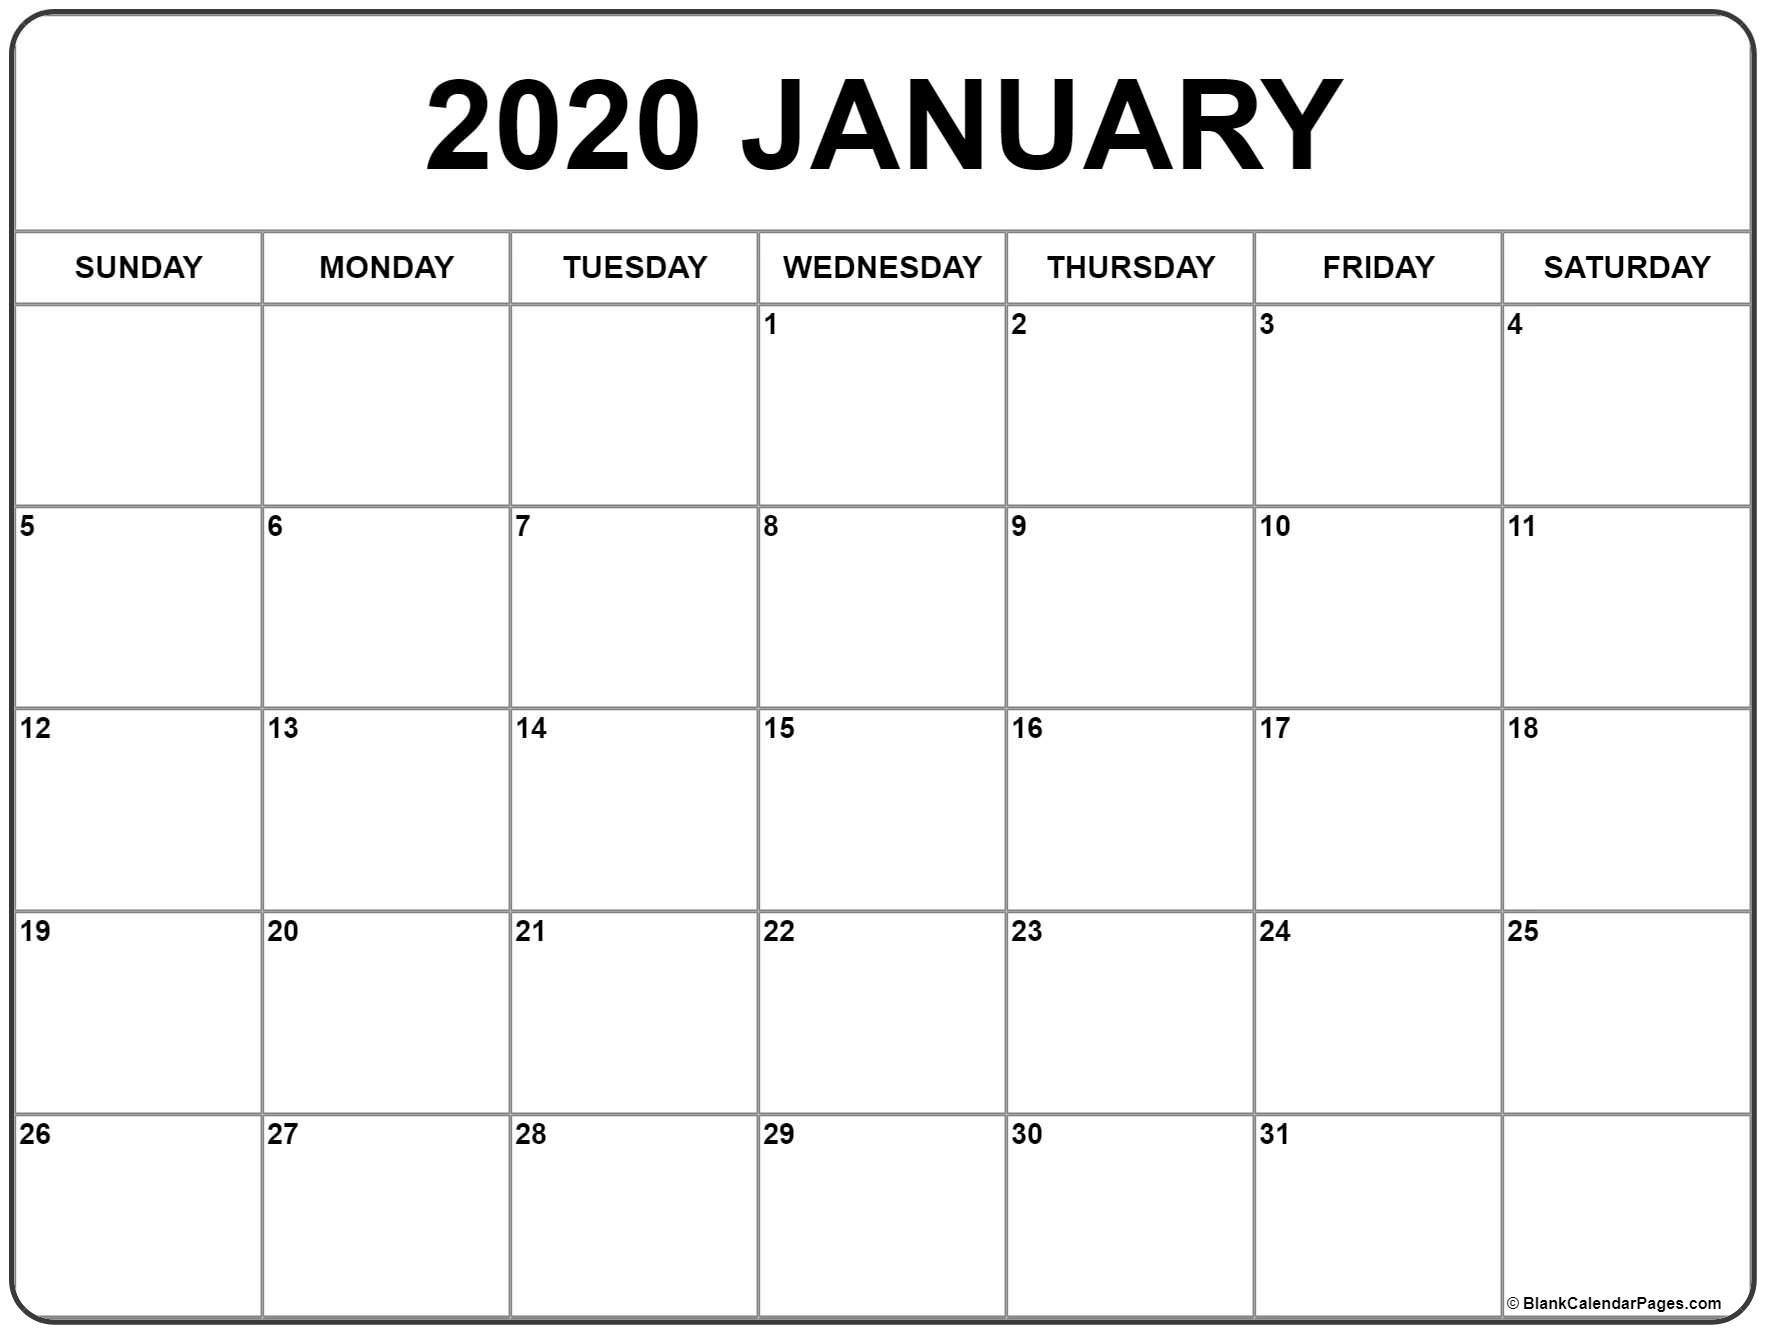 January 2020 Calendar | Free Printable Monthly Calendars-January And February 2020 Printable Calendar